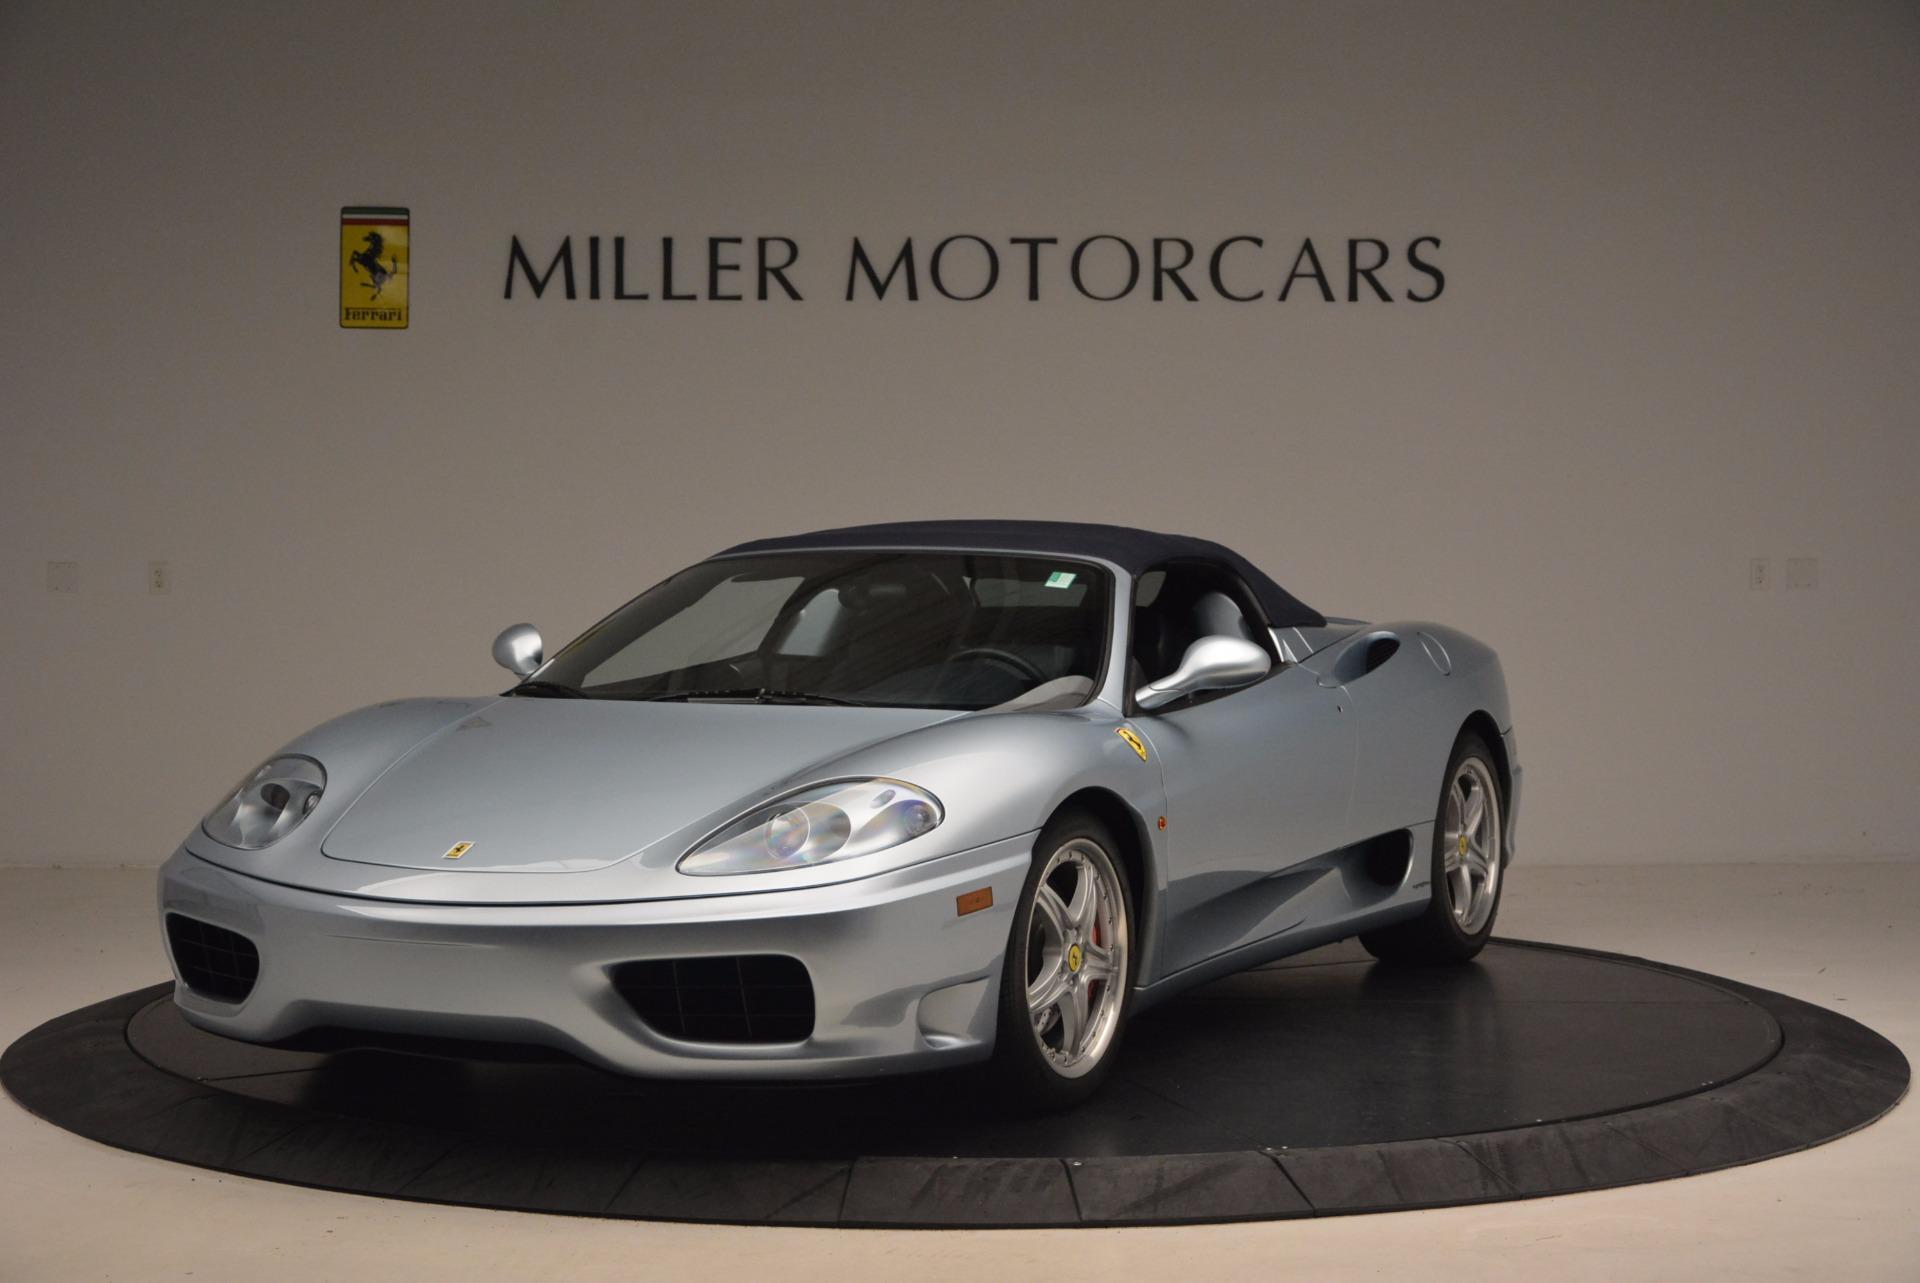 Used 2003 Ferrari 360 Spider 6-Speed Manual For Sale In Westport, CT 1445_p13